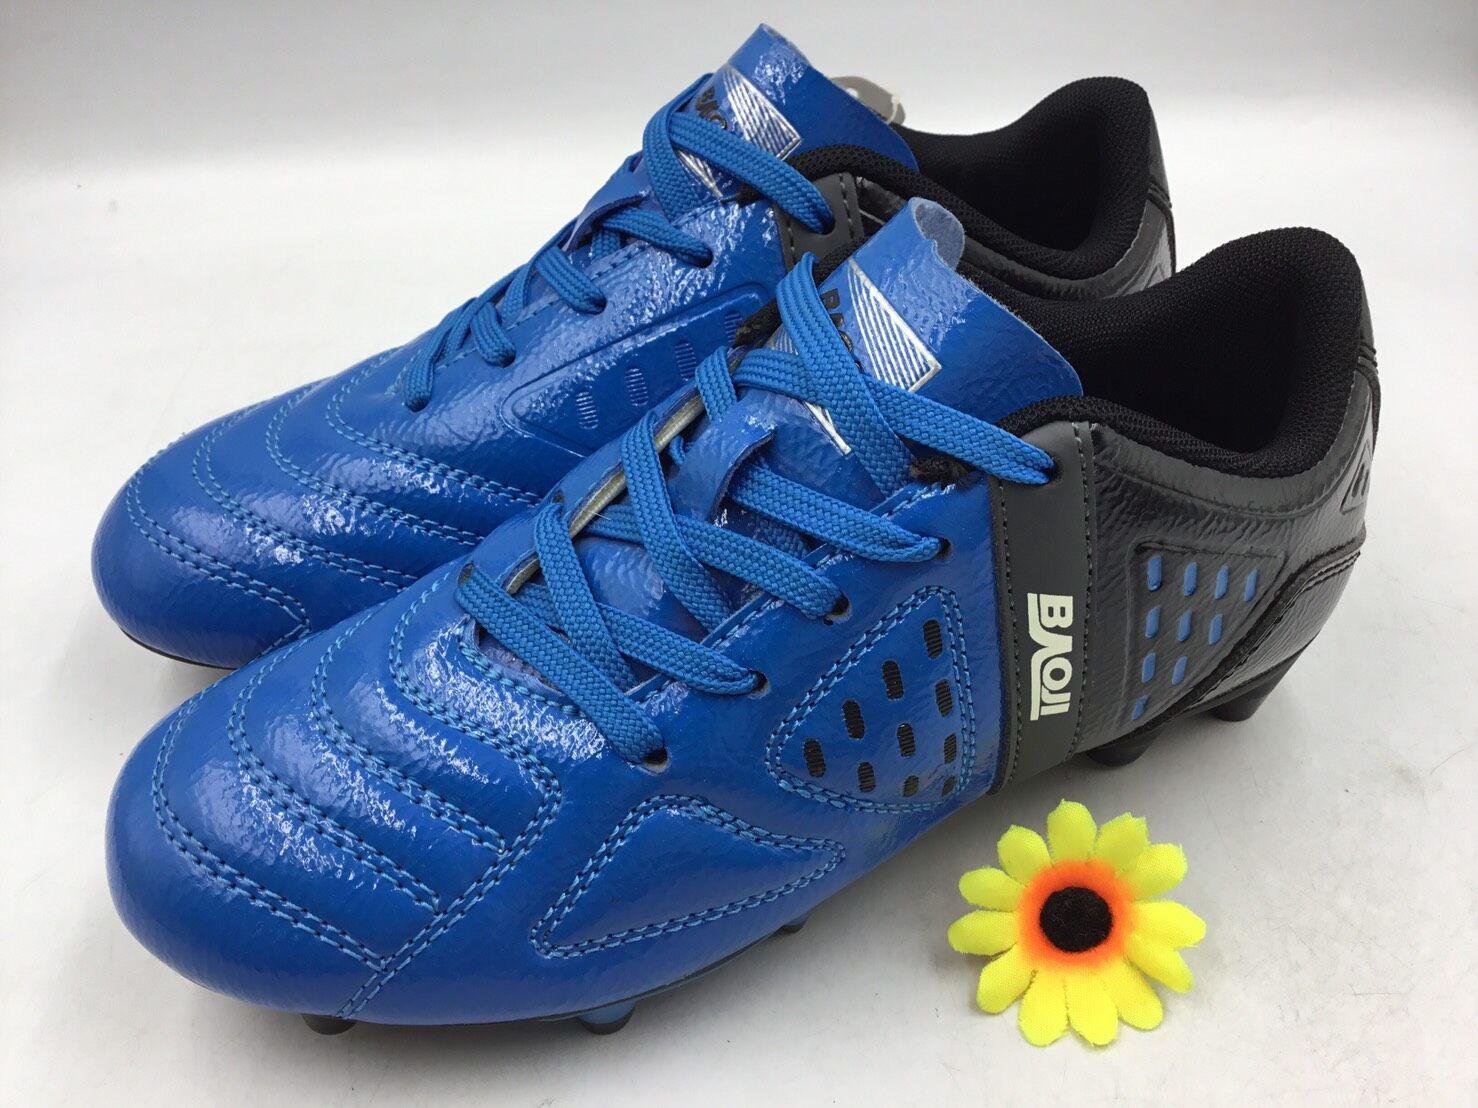 Baoji รุ่นgh817 รองเท้าสตั๊คเด็ก.